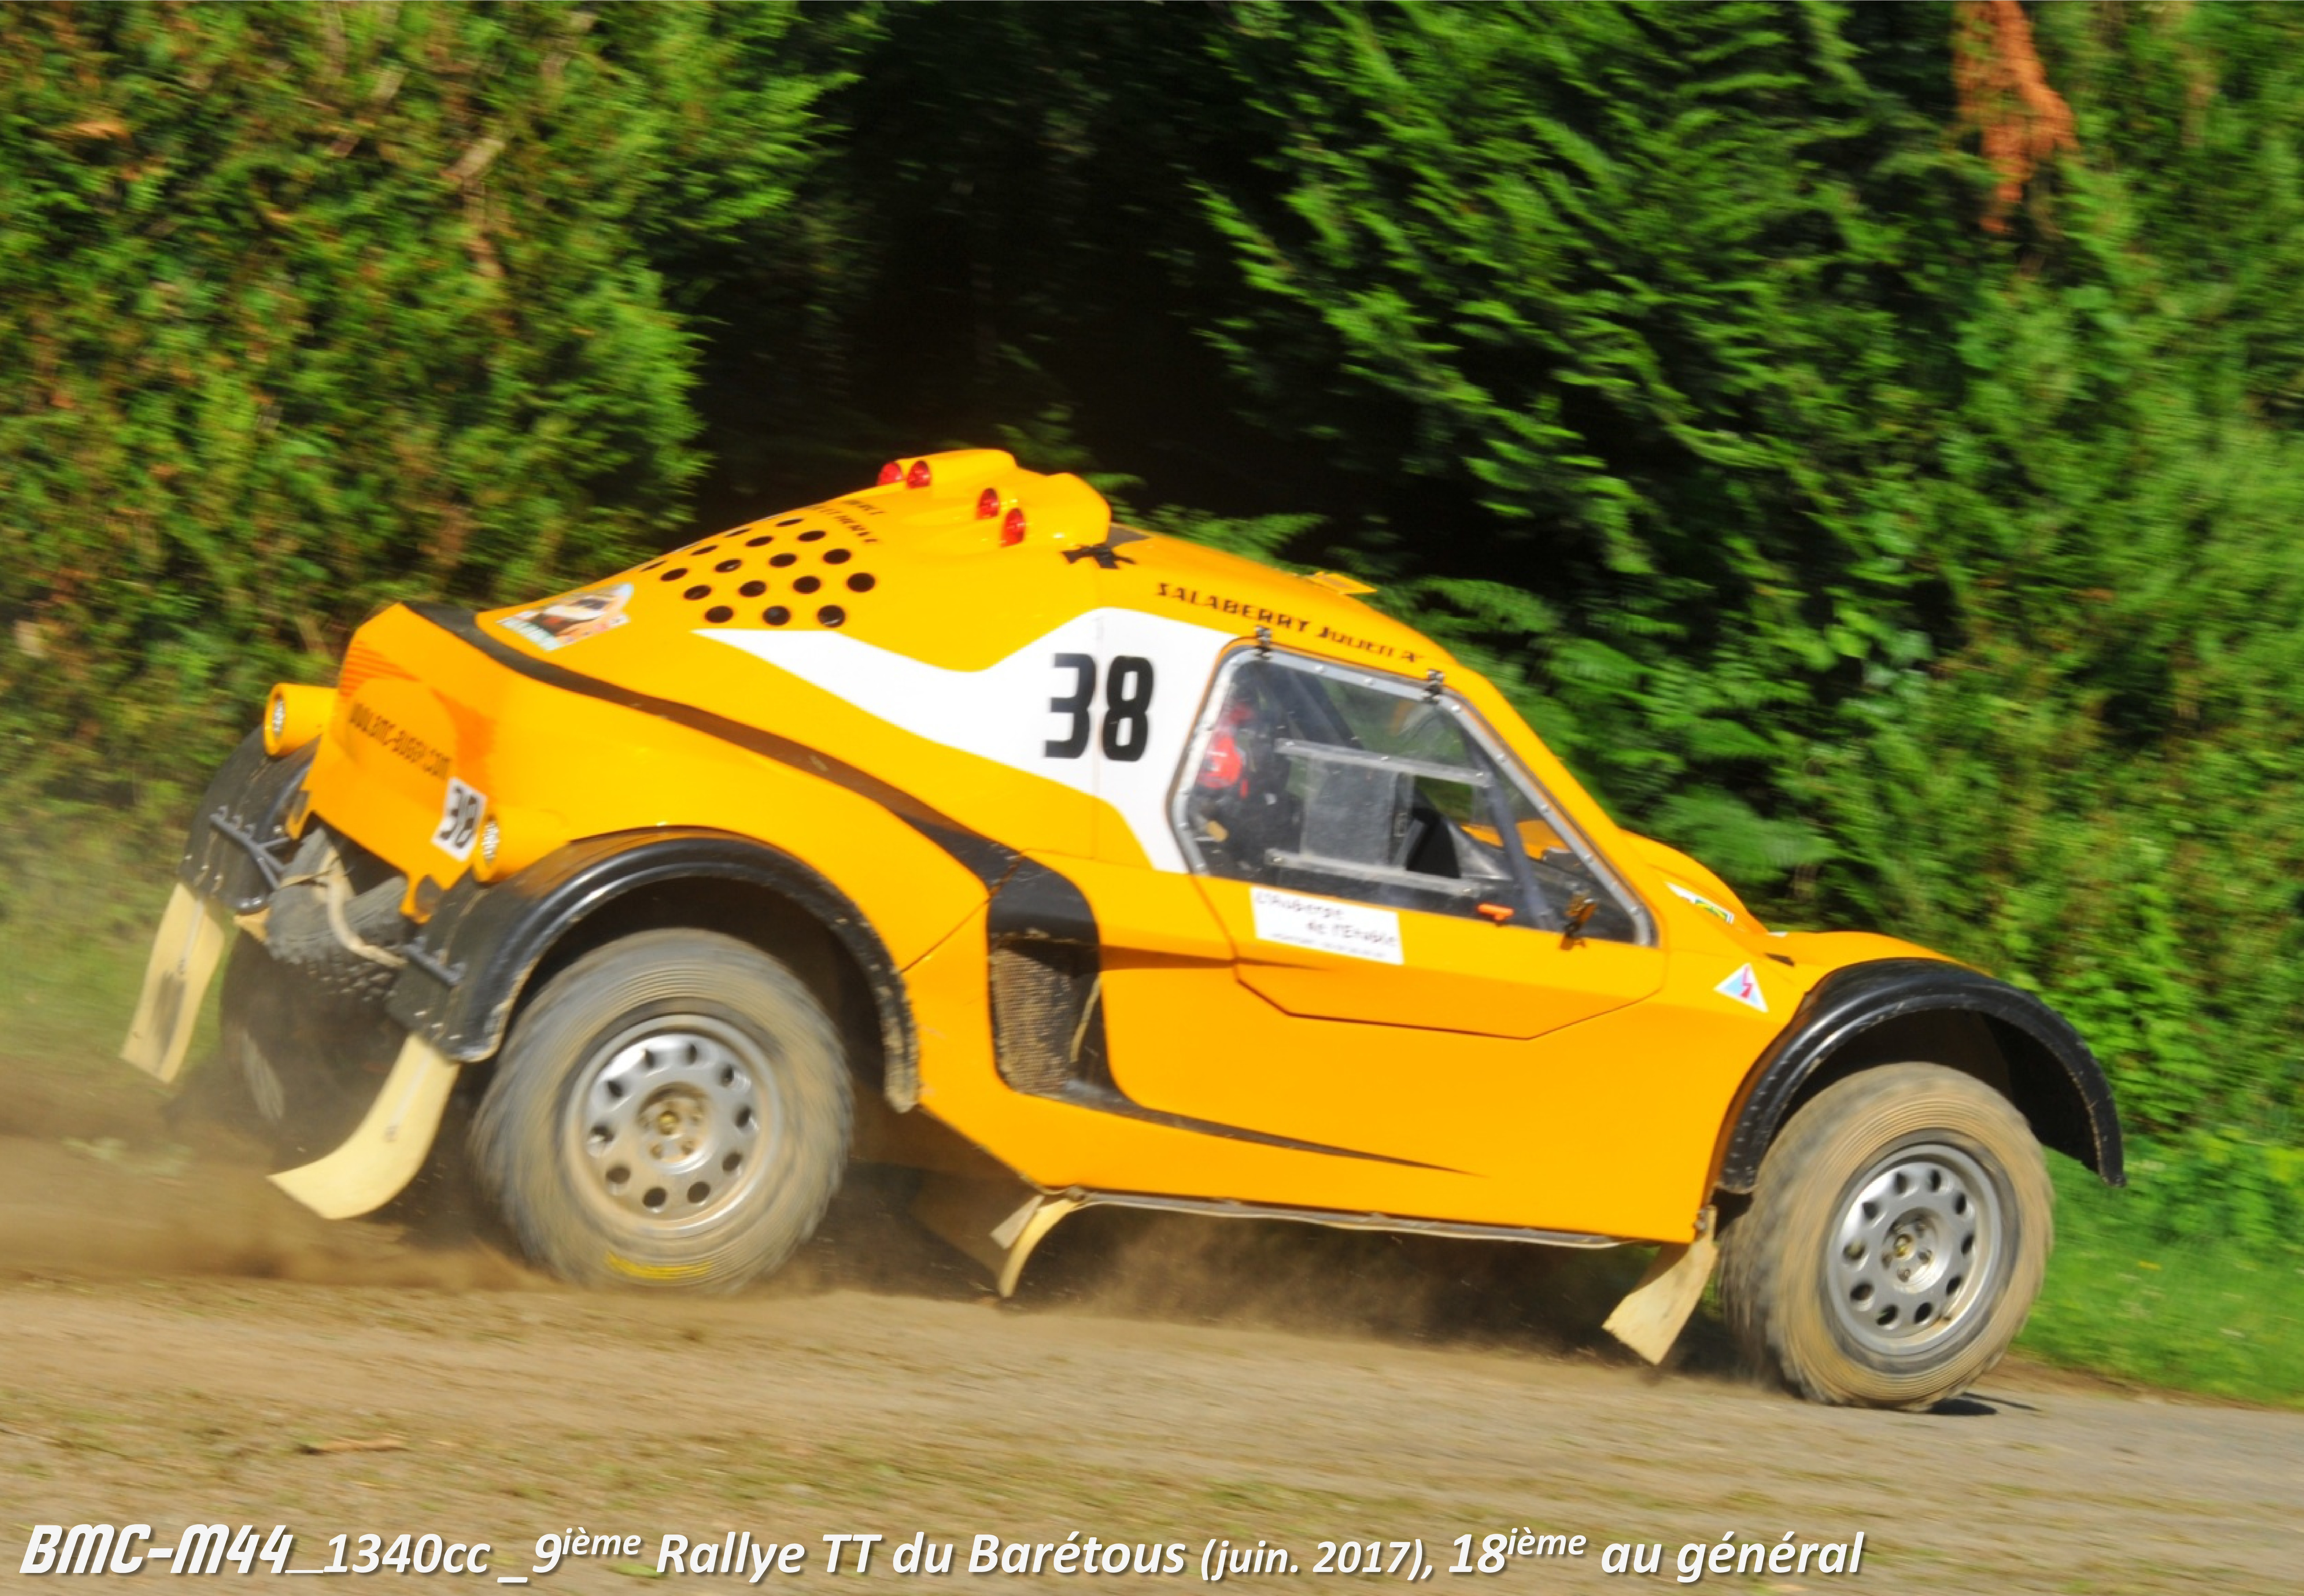 BMC-M44_Saison 2017_B. LAGARDERE - J. SALABERRY_ (8)